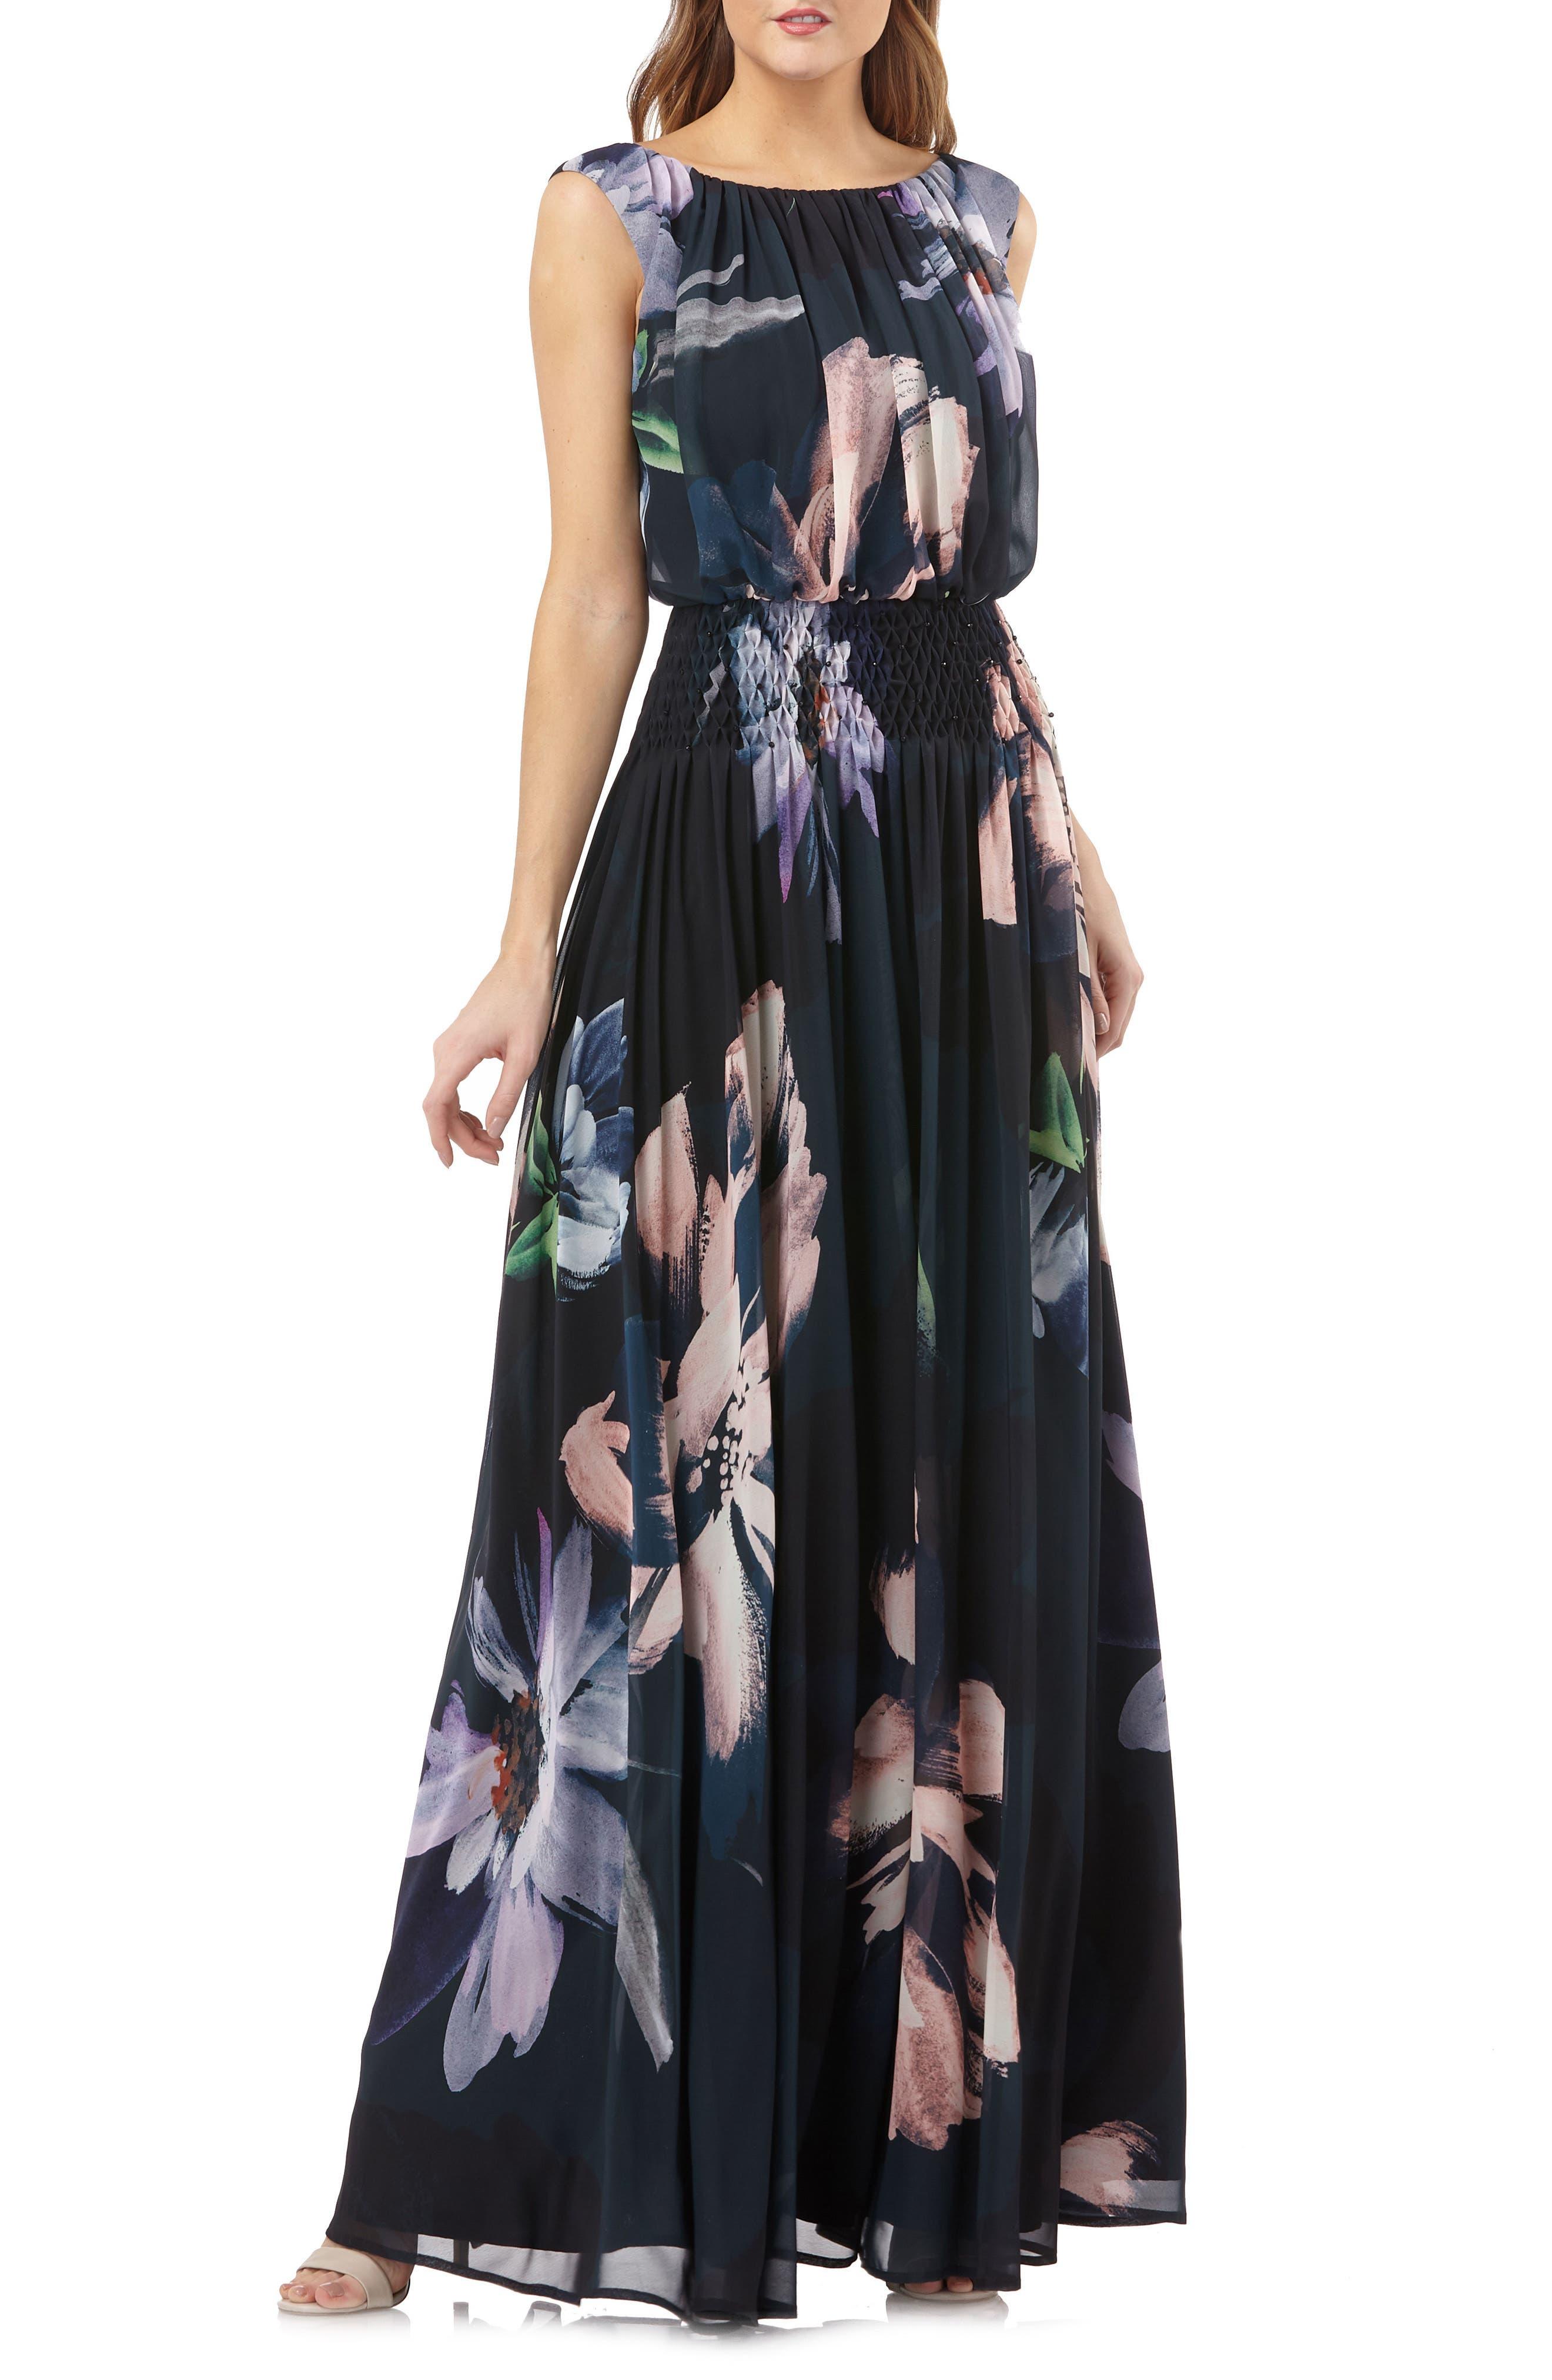 Floral Print Chiffon Gown,                             Main thumbnail 1, color,                             Black Multi